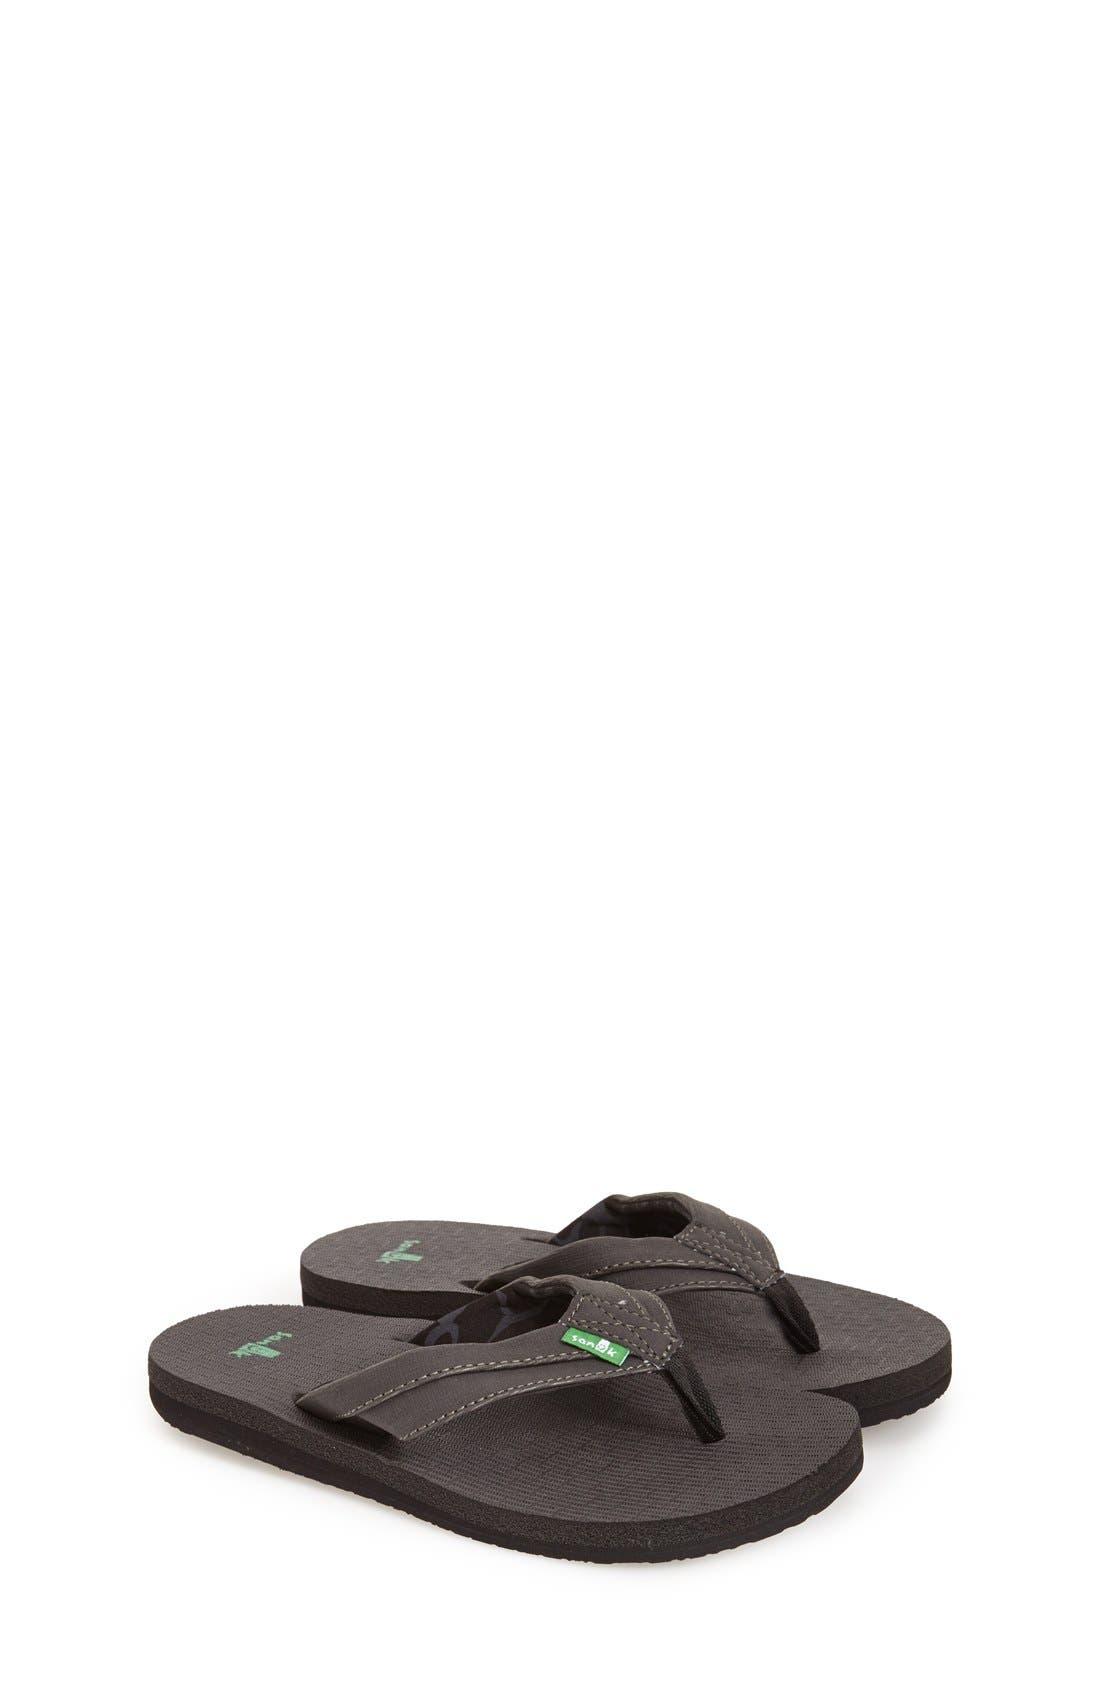 'Rootbeer Cozy' Lightweight Flip Flop Sandal,                         Main,                         color, 001